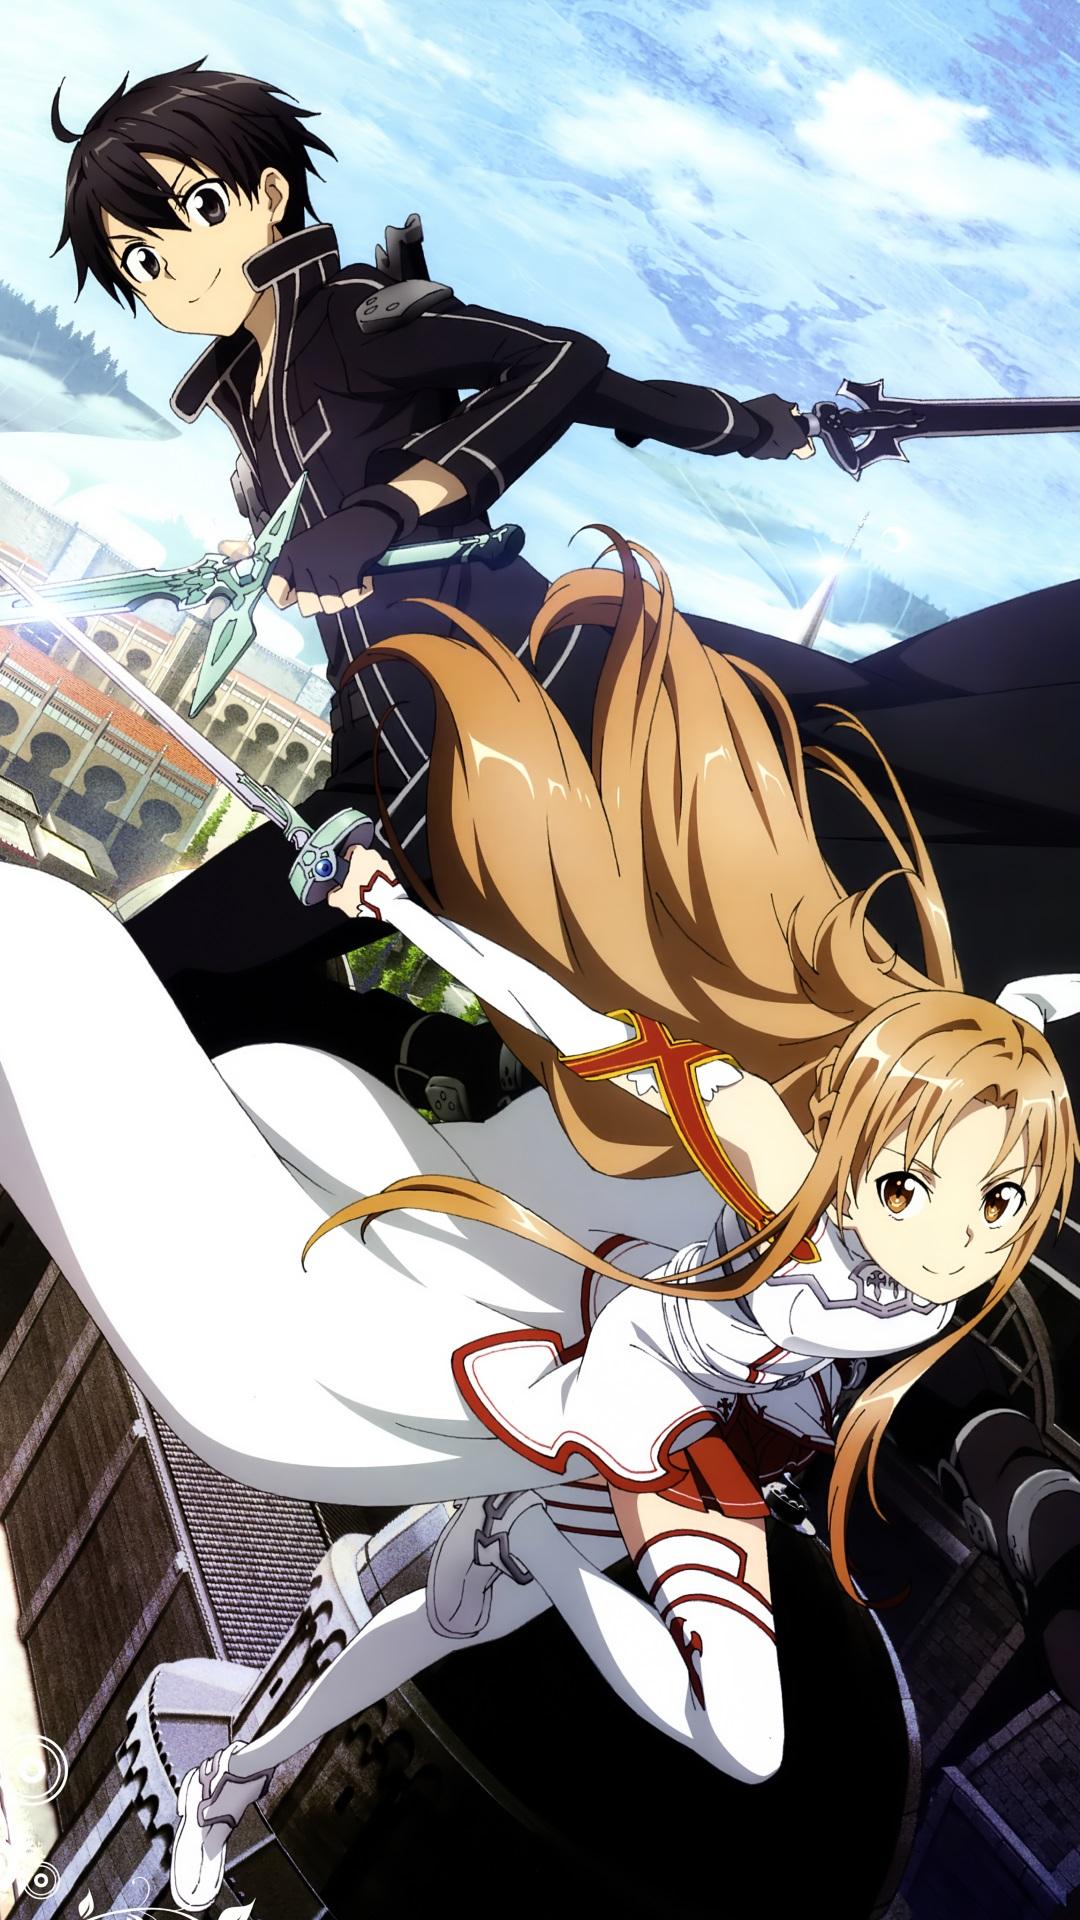 Sword Art Online 2 Kirito Asuna.LG D802 Optimus G2